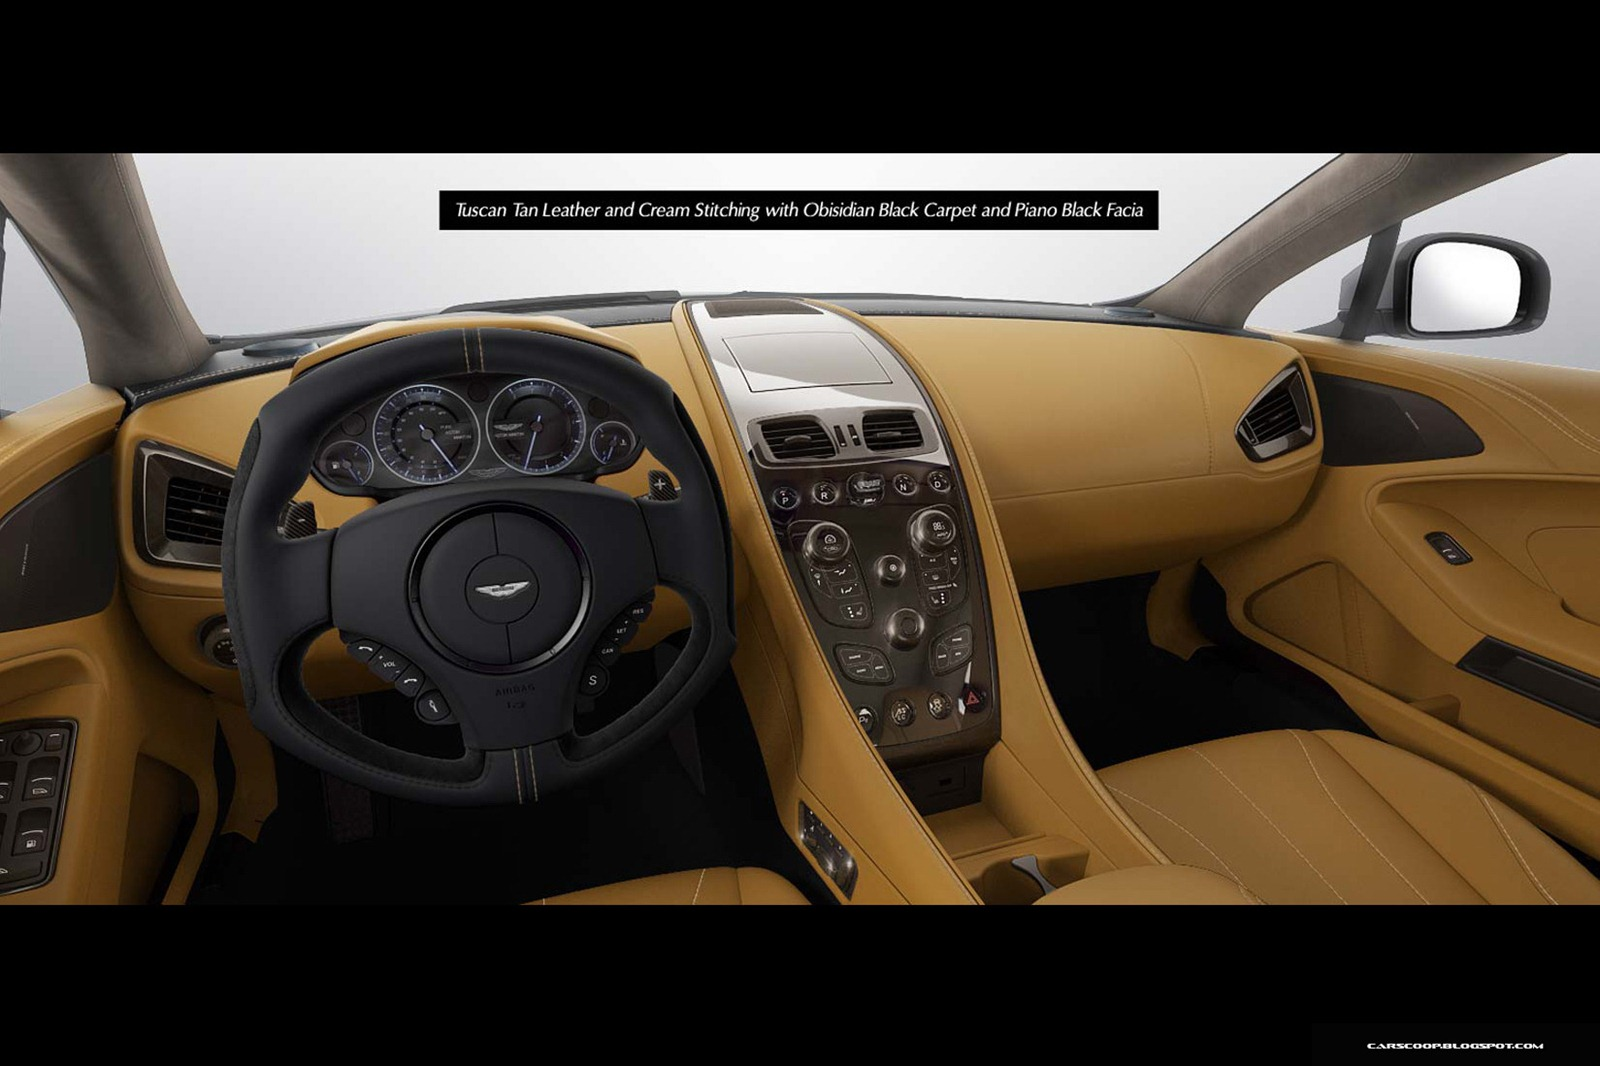 aston martin vanquish 2012 interior. aston martin vanquish 2012 present aston martin interior n